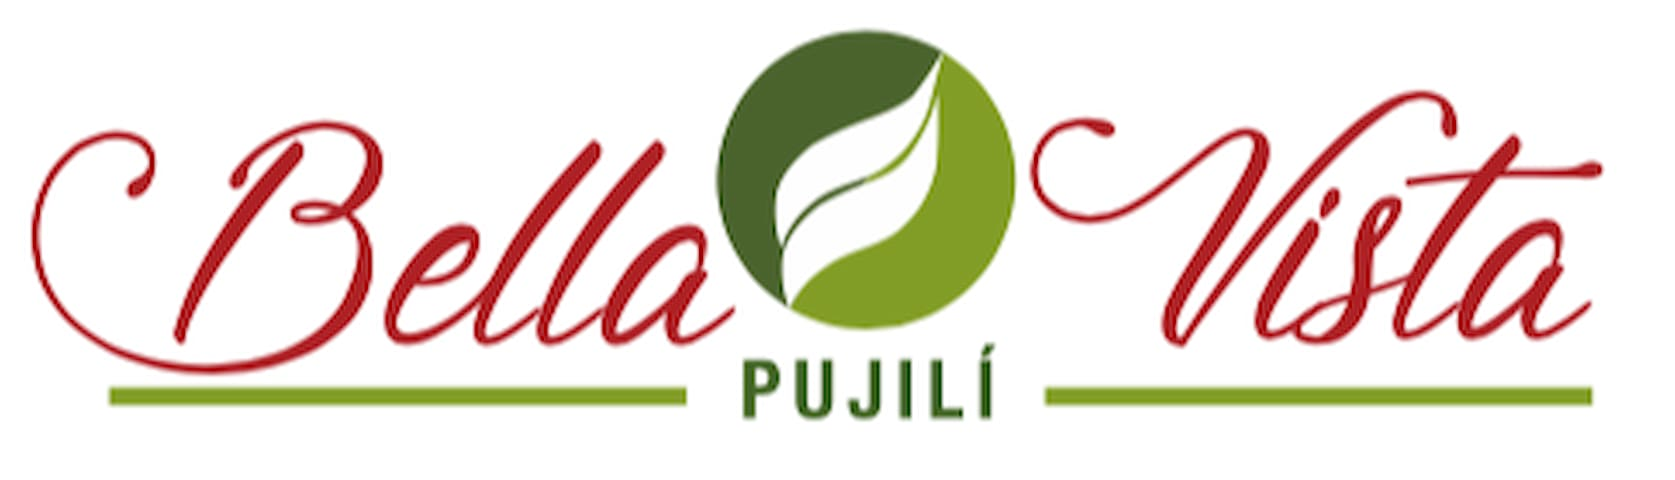 Bella Vista Pujili